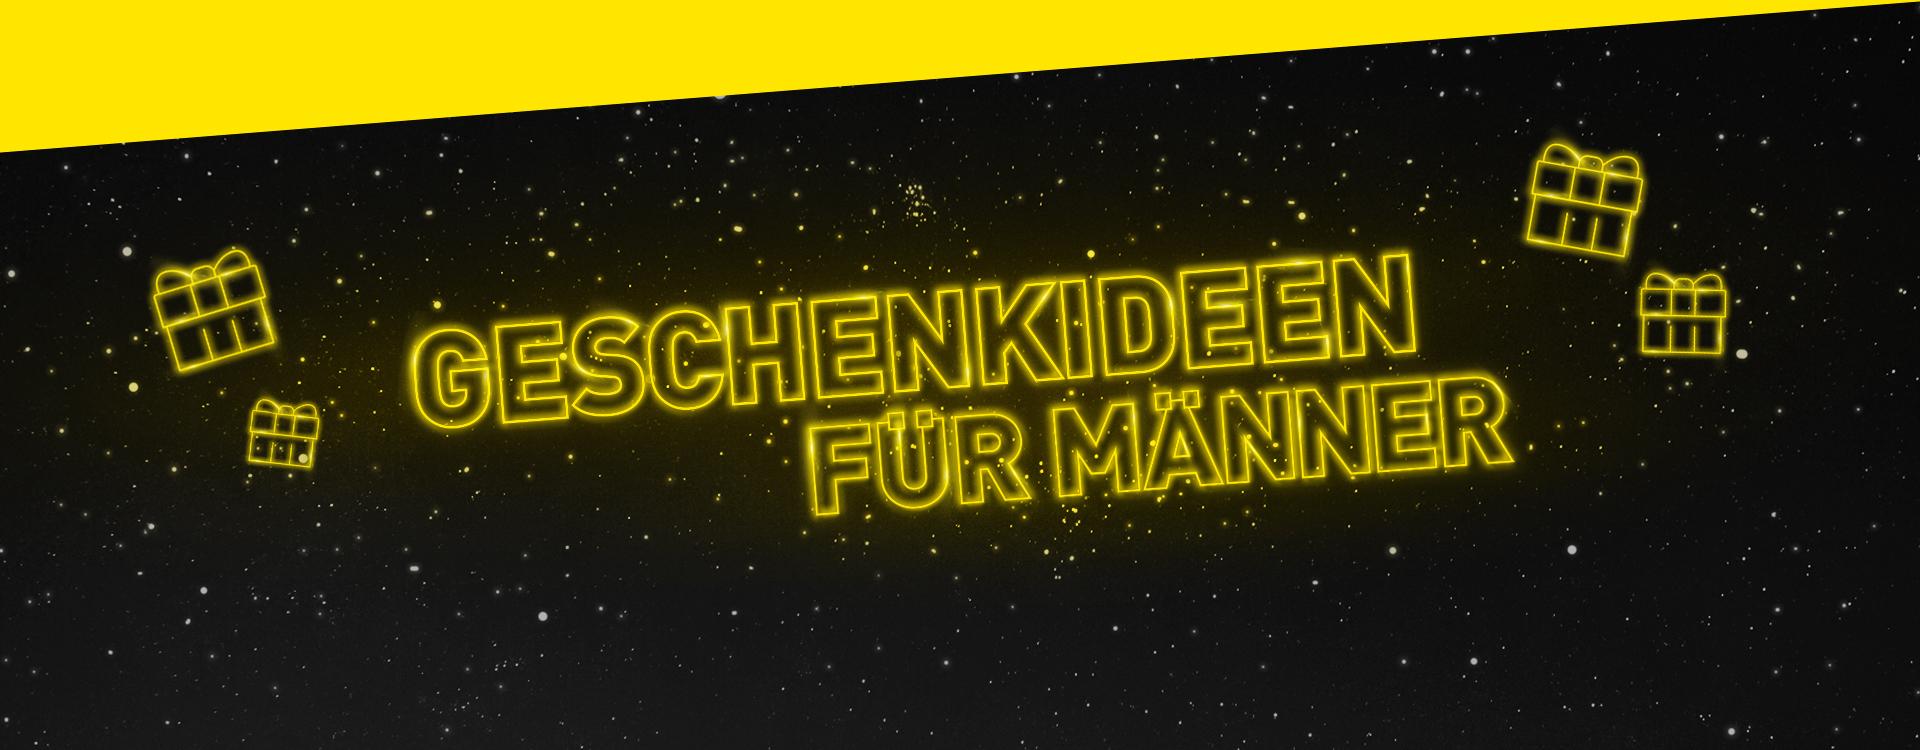 MaennerGeschenkideen-Kategorieb-hnen-Desktop-1920x750px